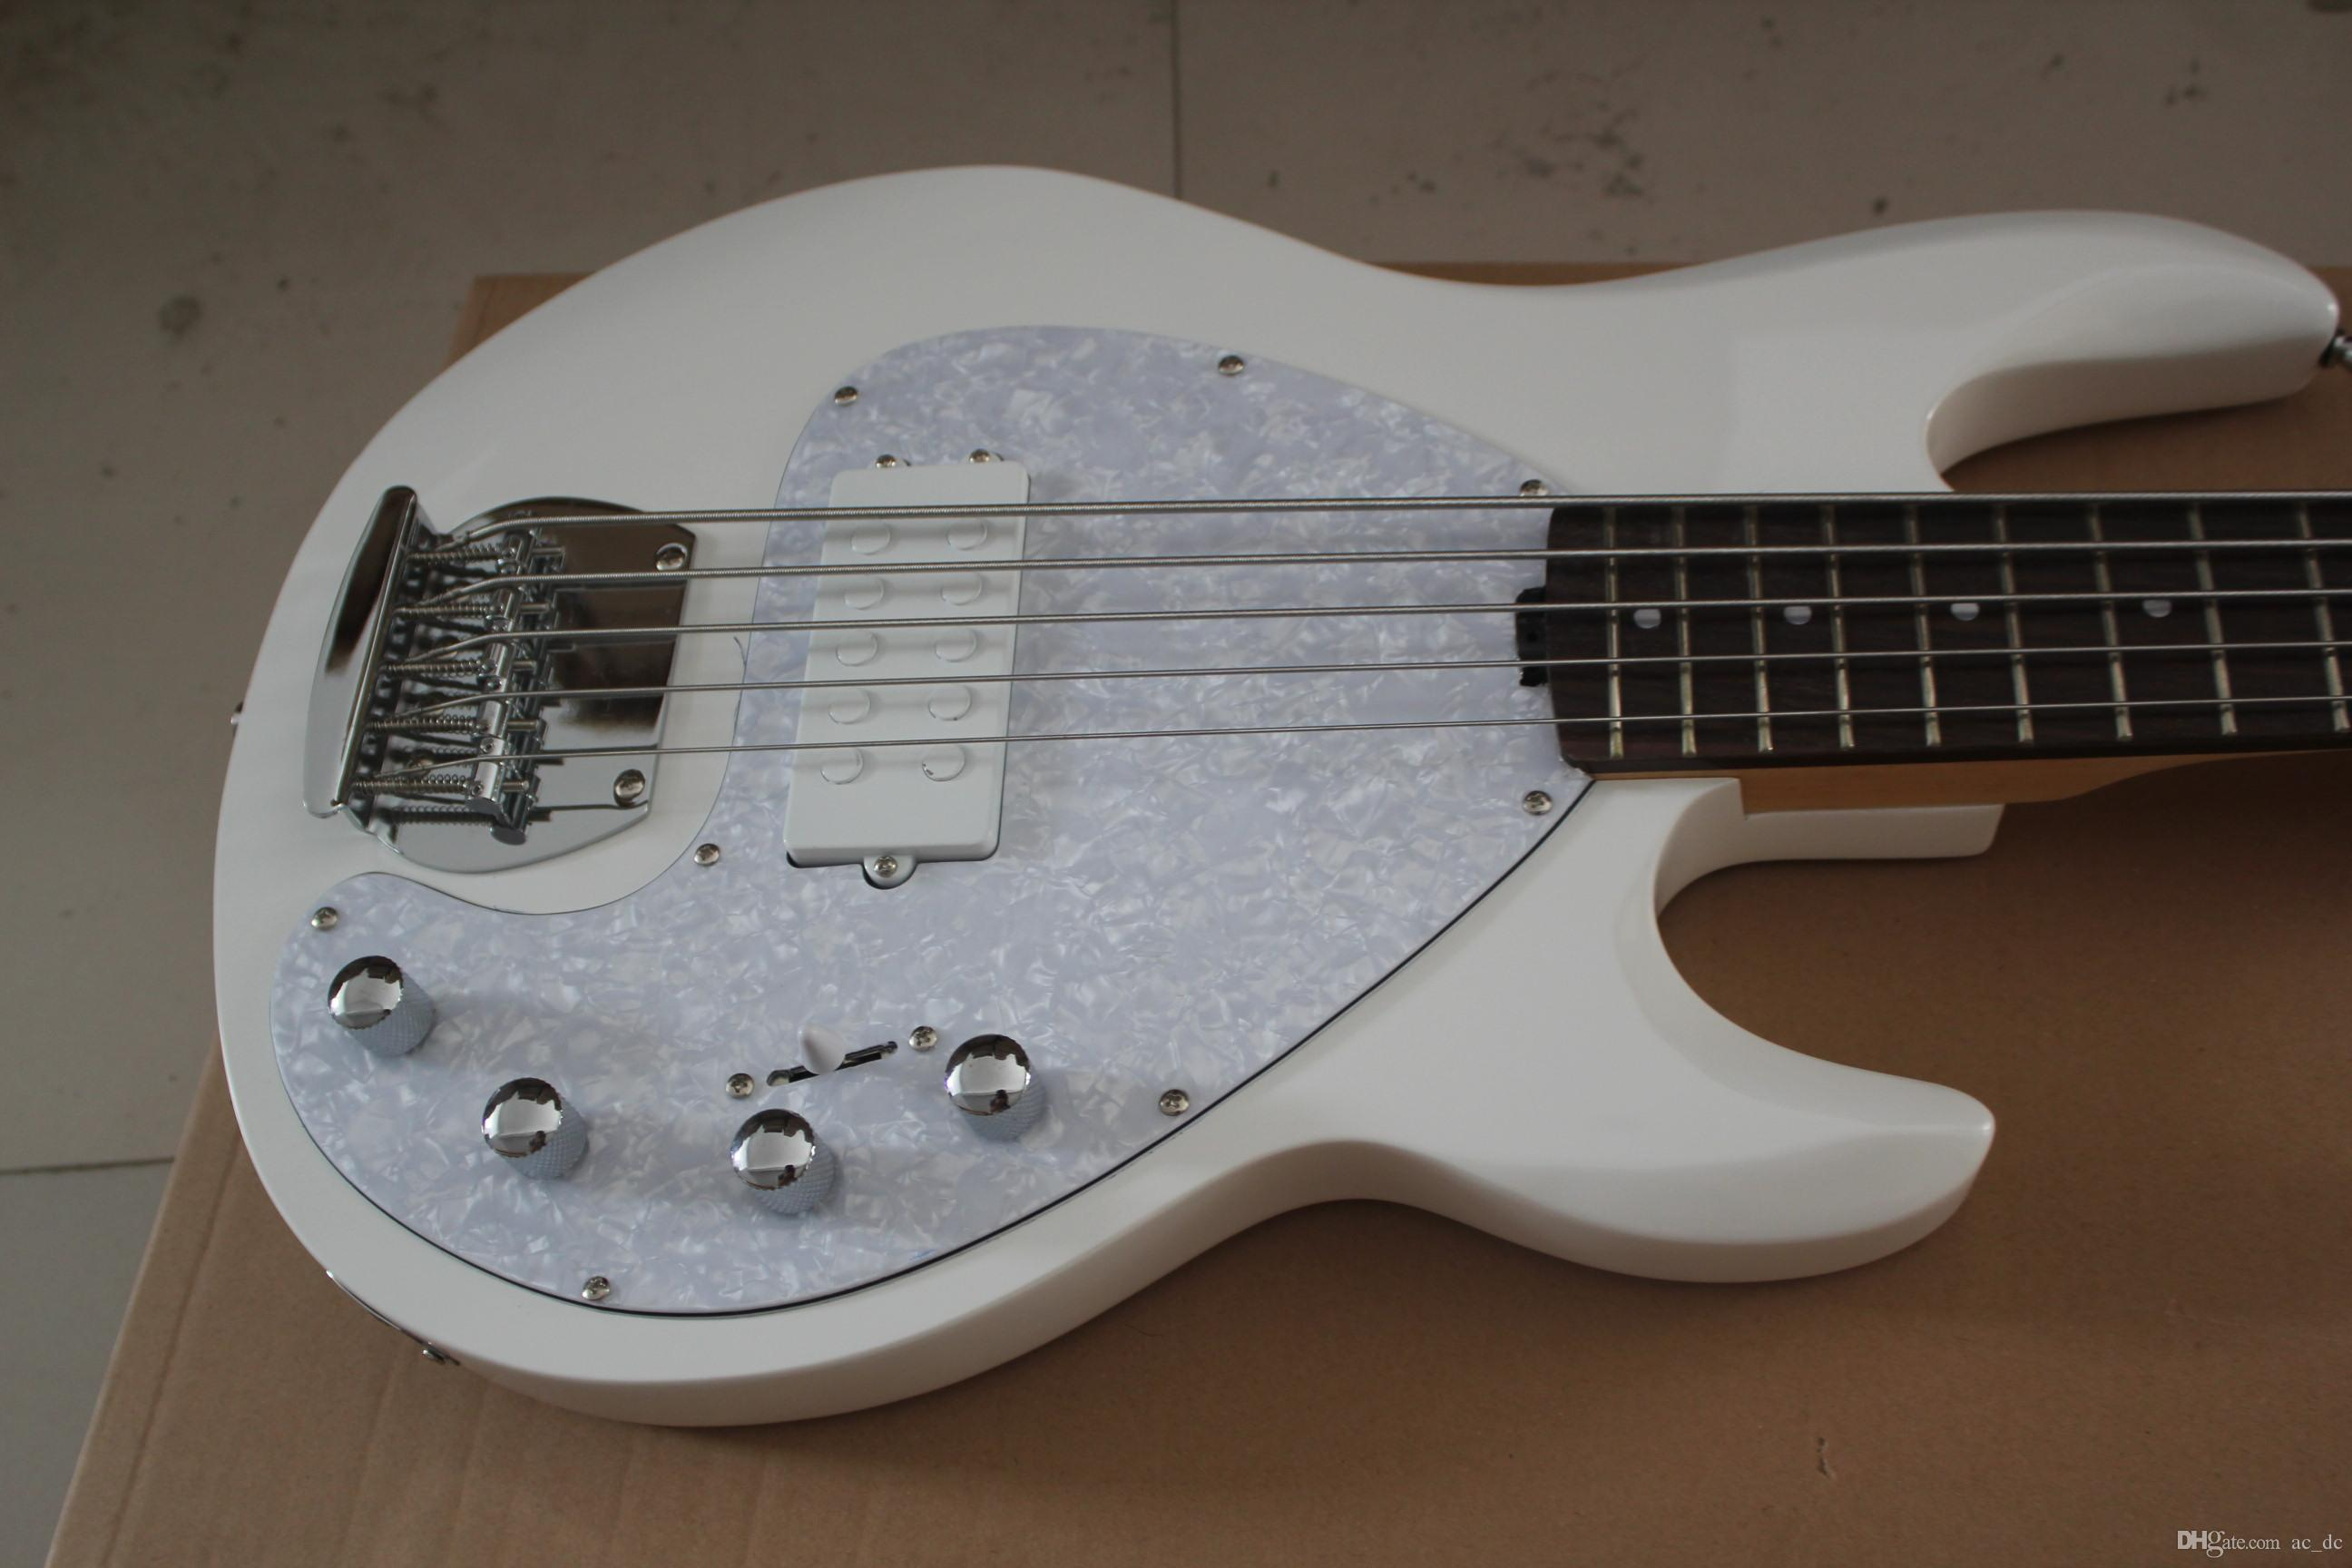 music man 5 strings bass ernie ball stingray white electric guitar maple neck white pickguard. Black Bedroom Furniture Sets. Home Design Ideas